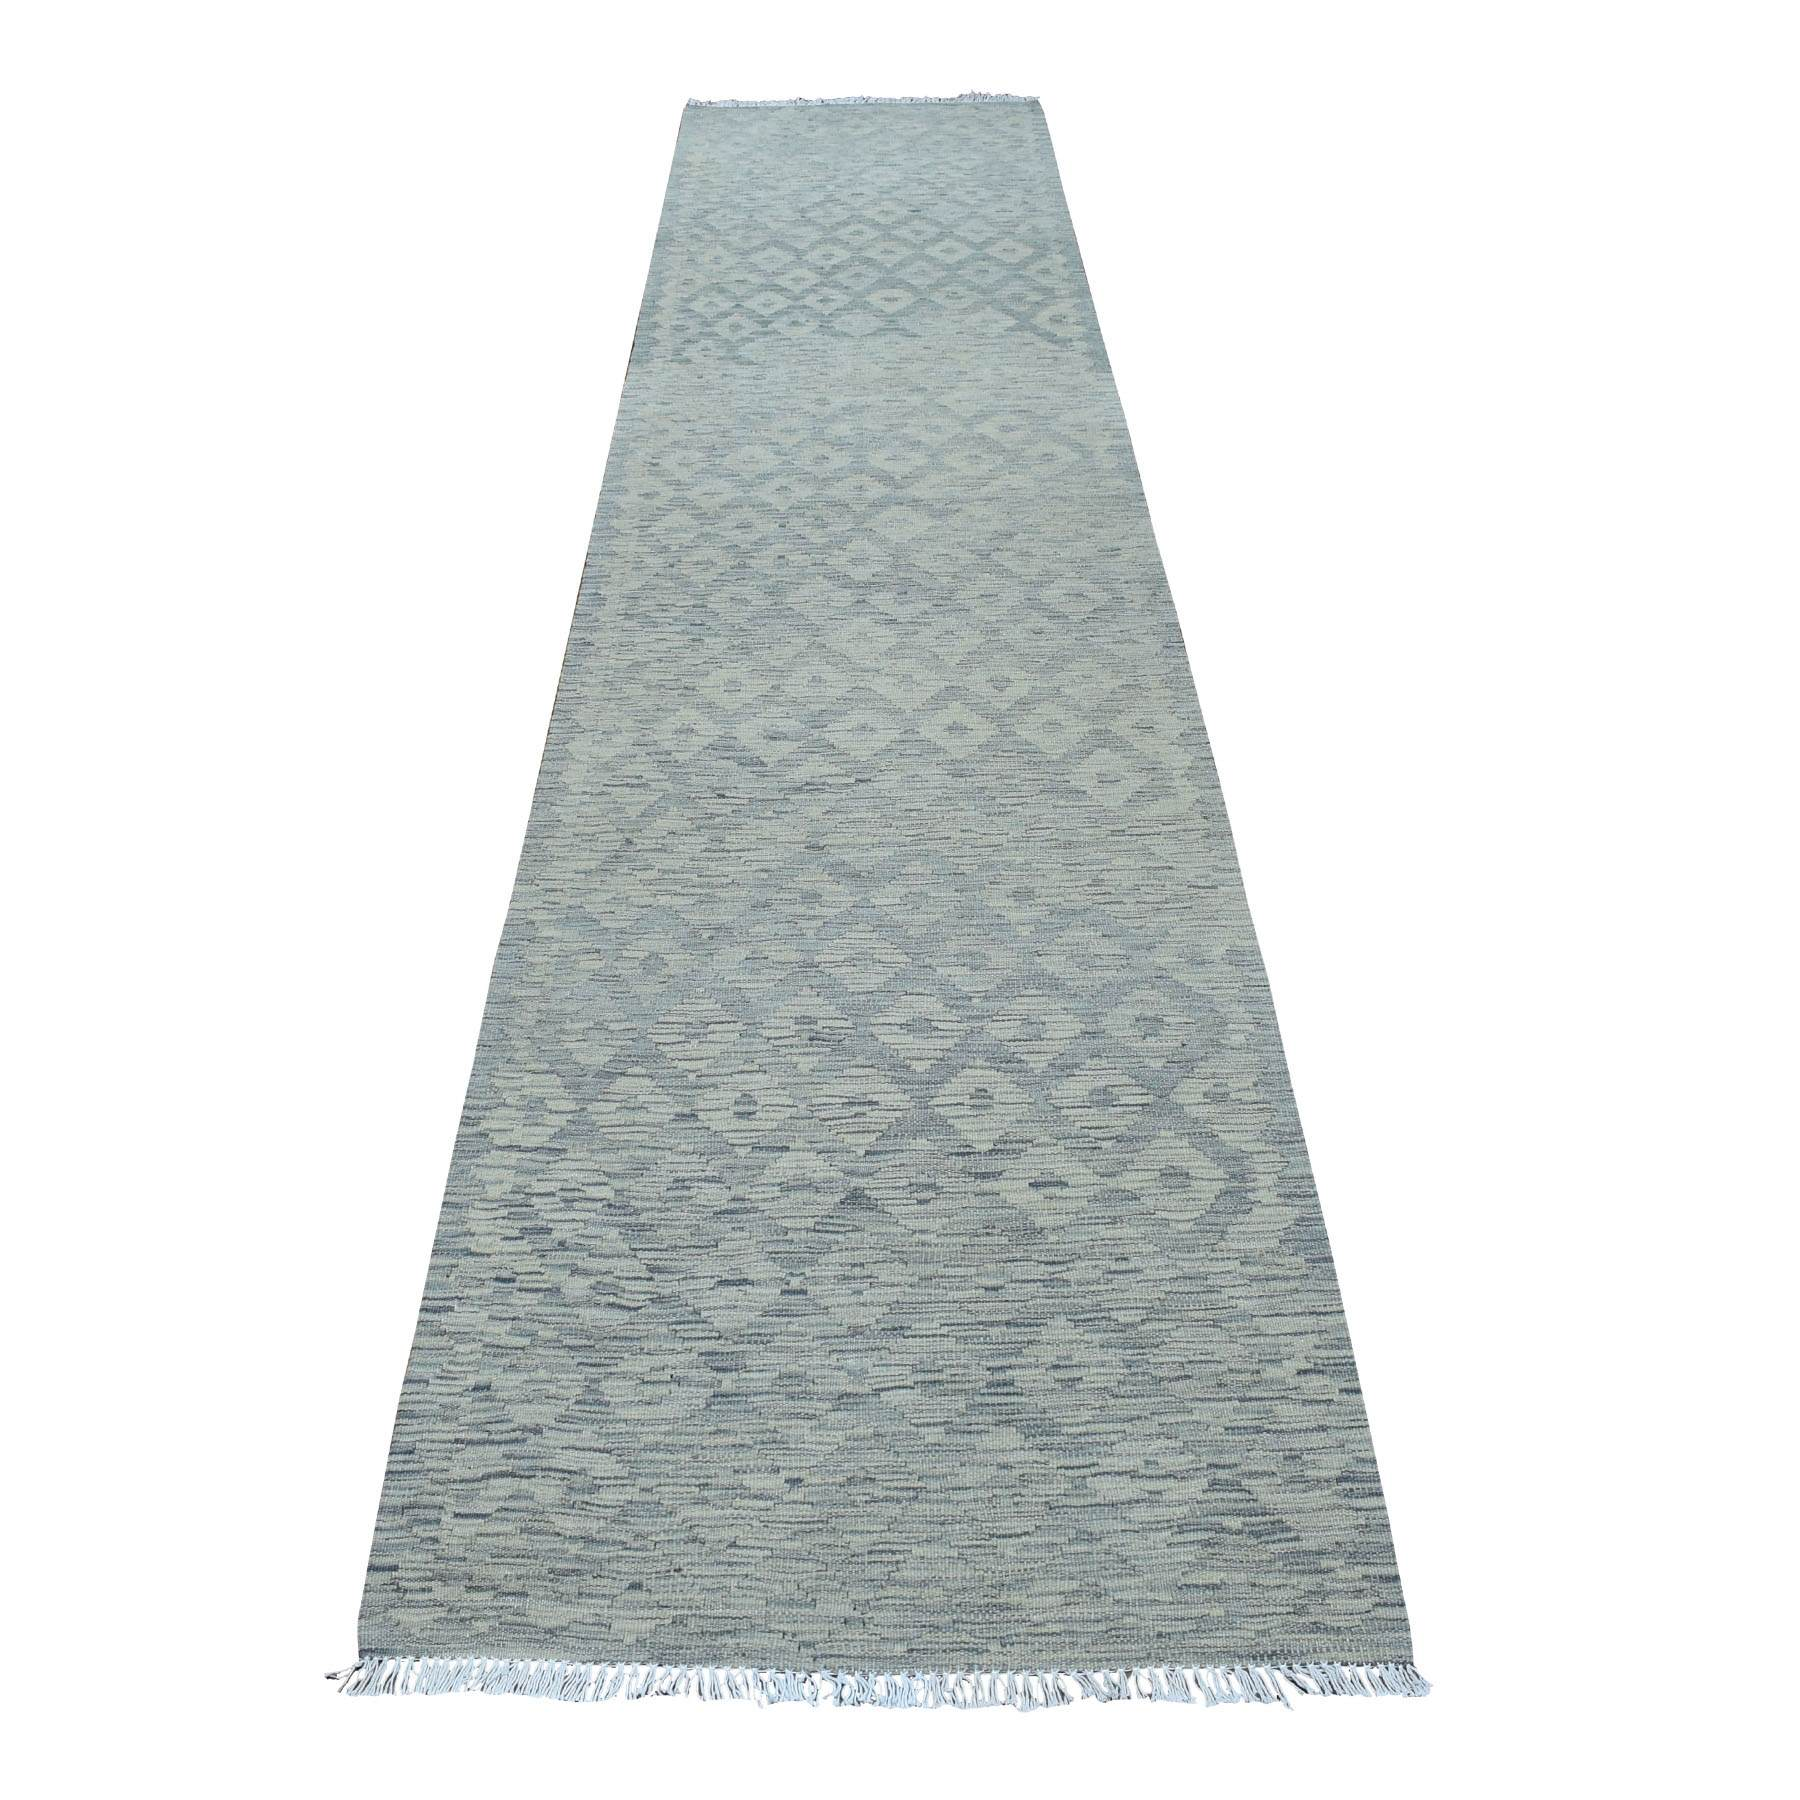 "2'9""x12'8"" Undyed Natural Wool Afghan Kilim Reversible Hand Woven Runner Oriental Rug 54261"